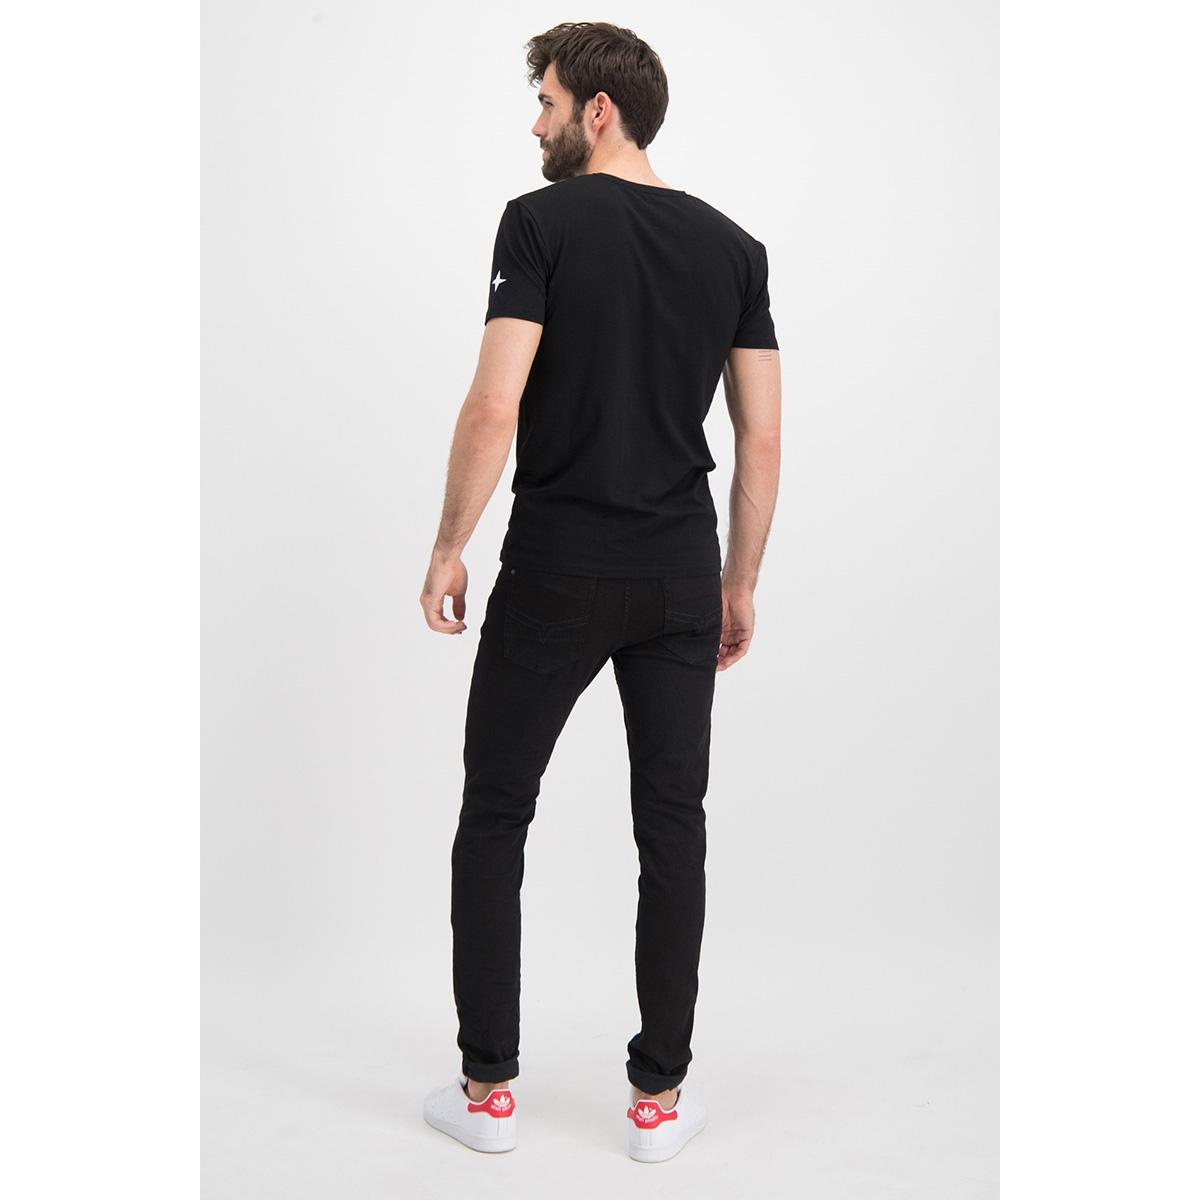 tee v me 0001 haze & finn t-shirt black